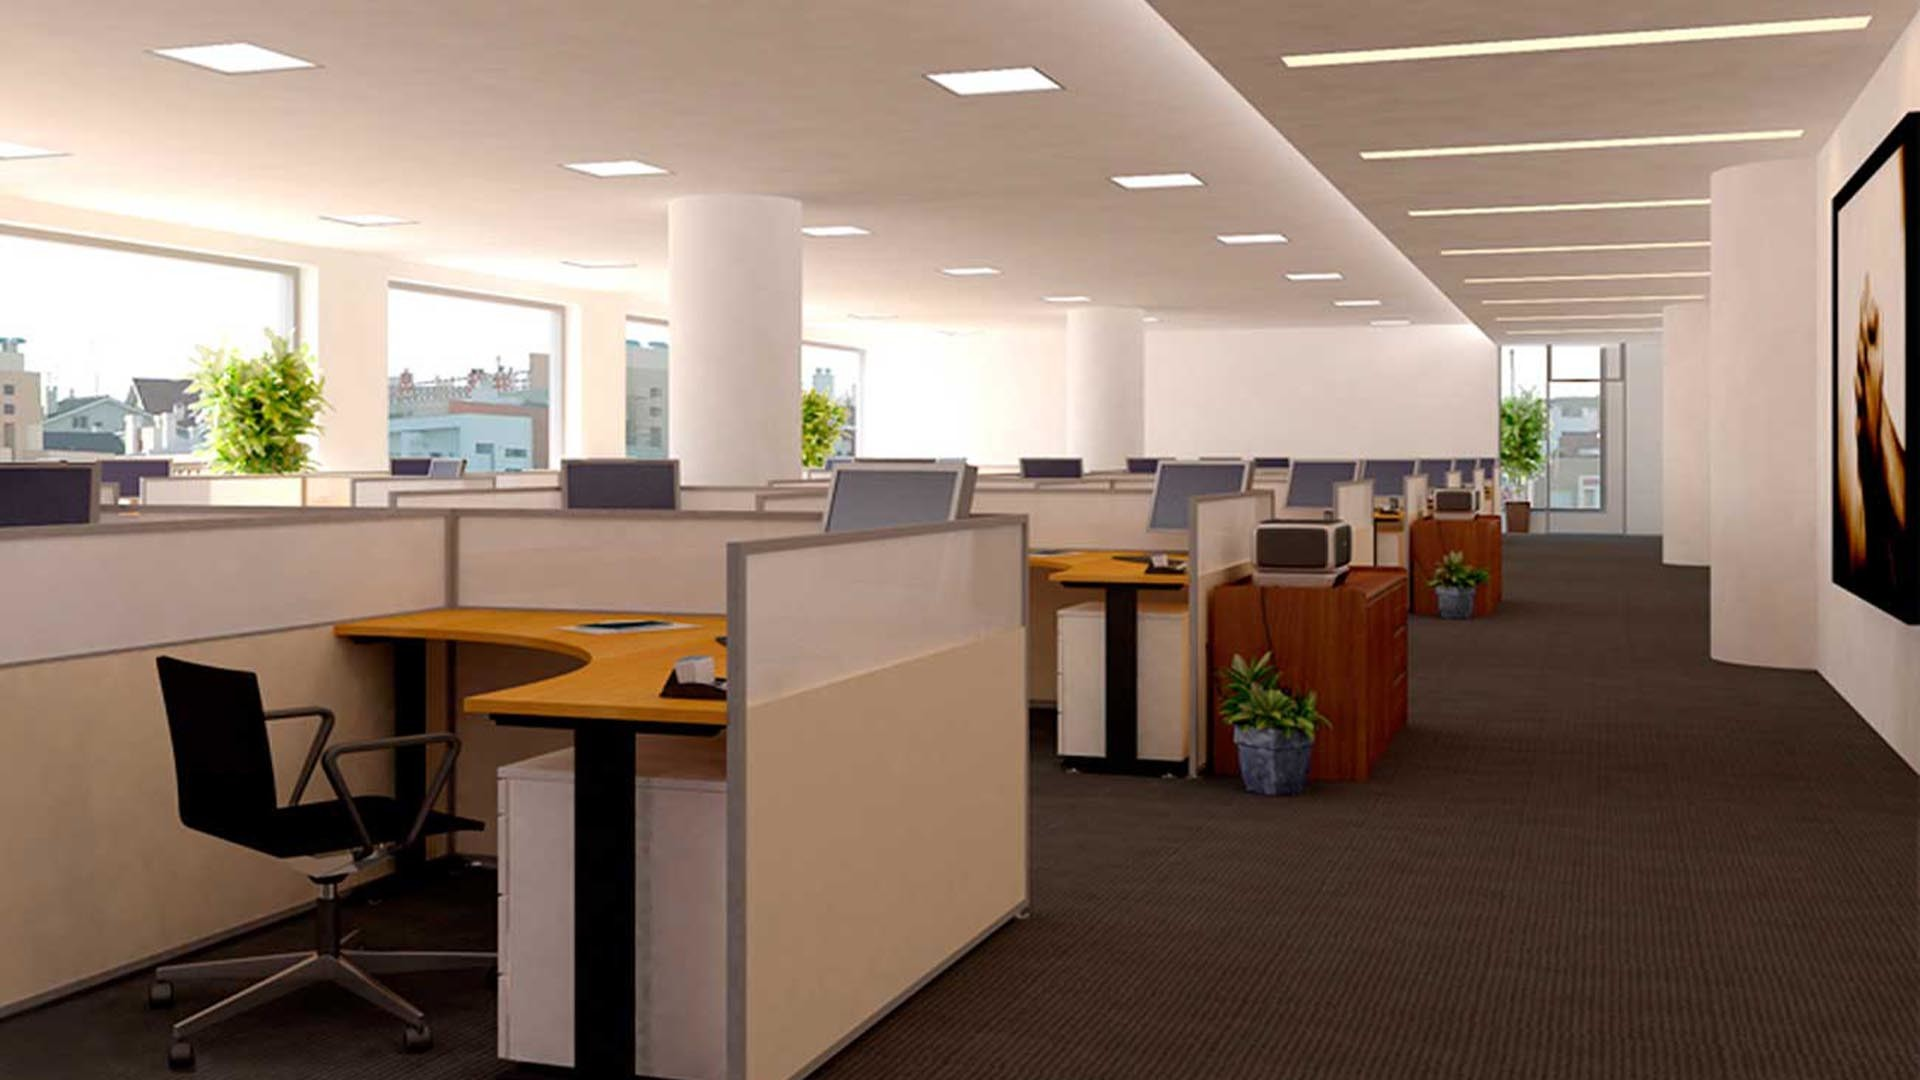 office background room interior